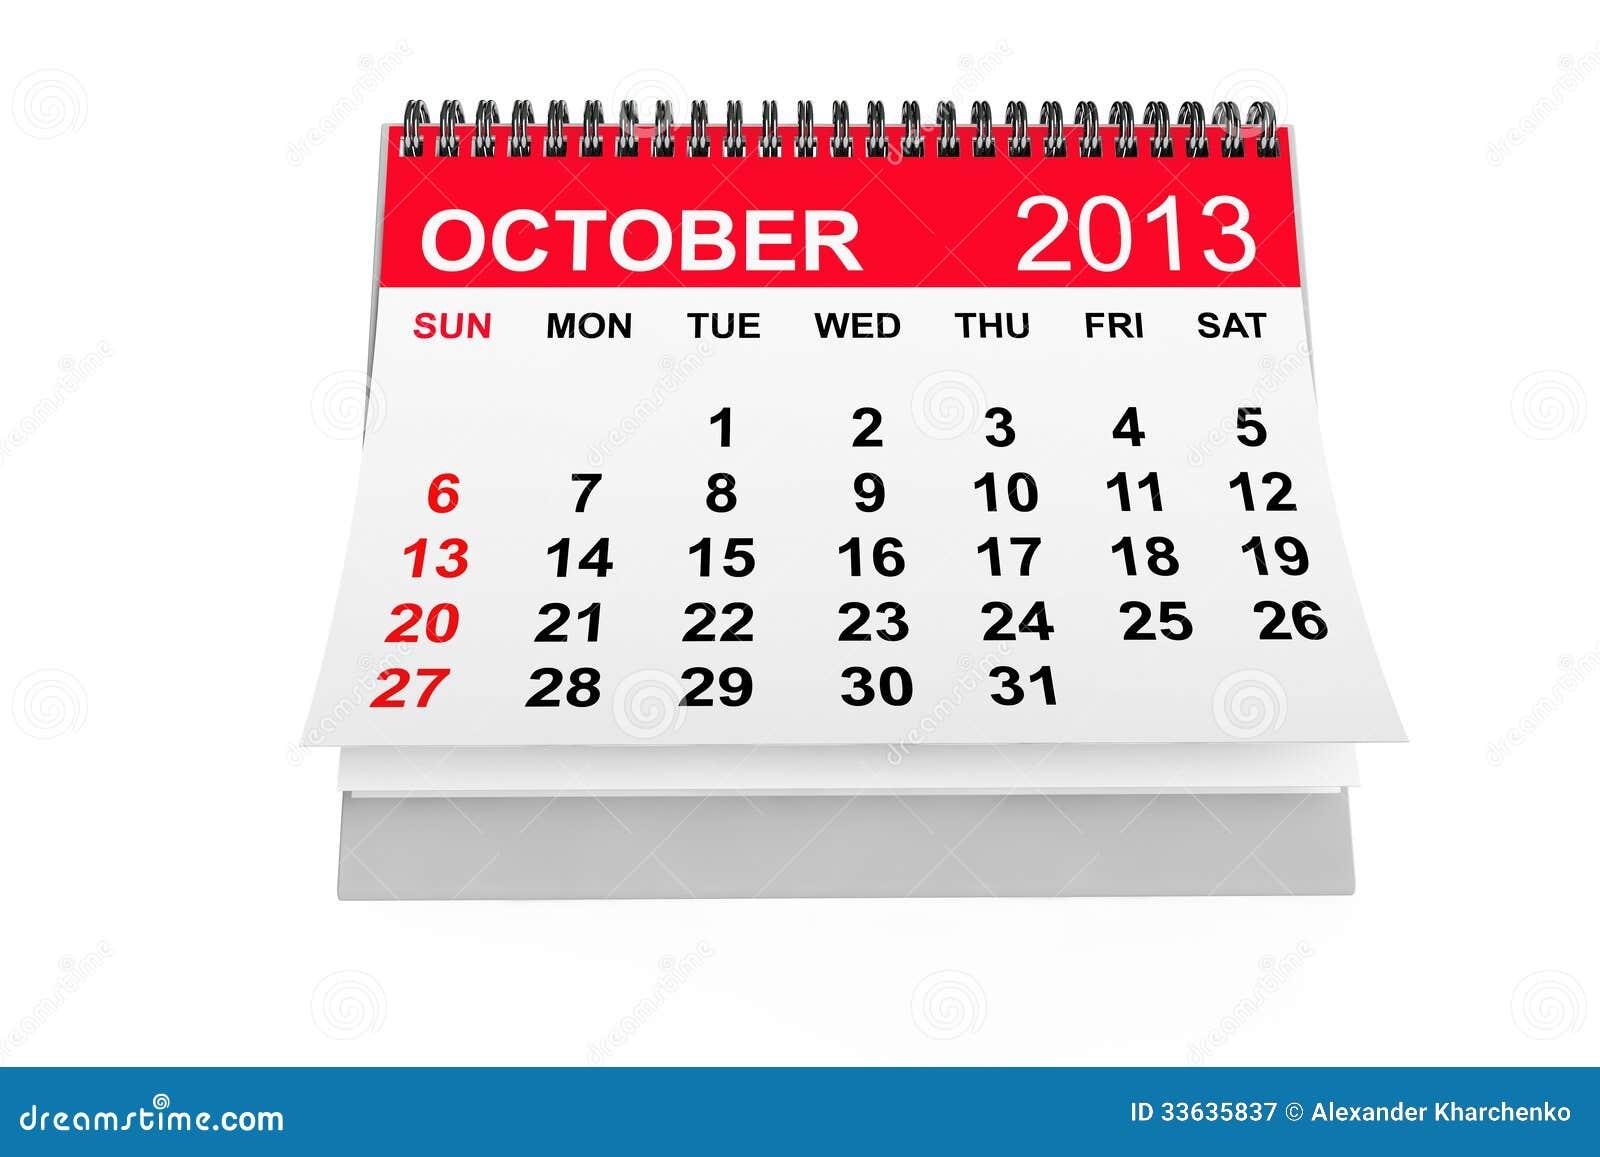 calendar october 2013 stock illustration illustration of numbers